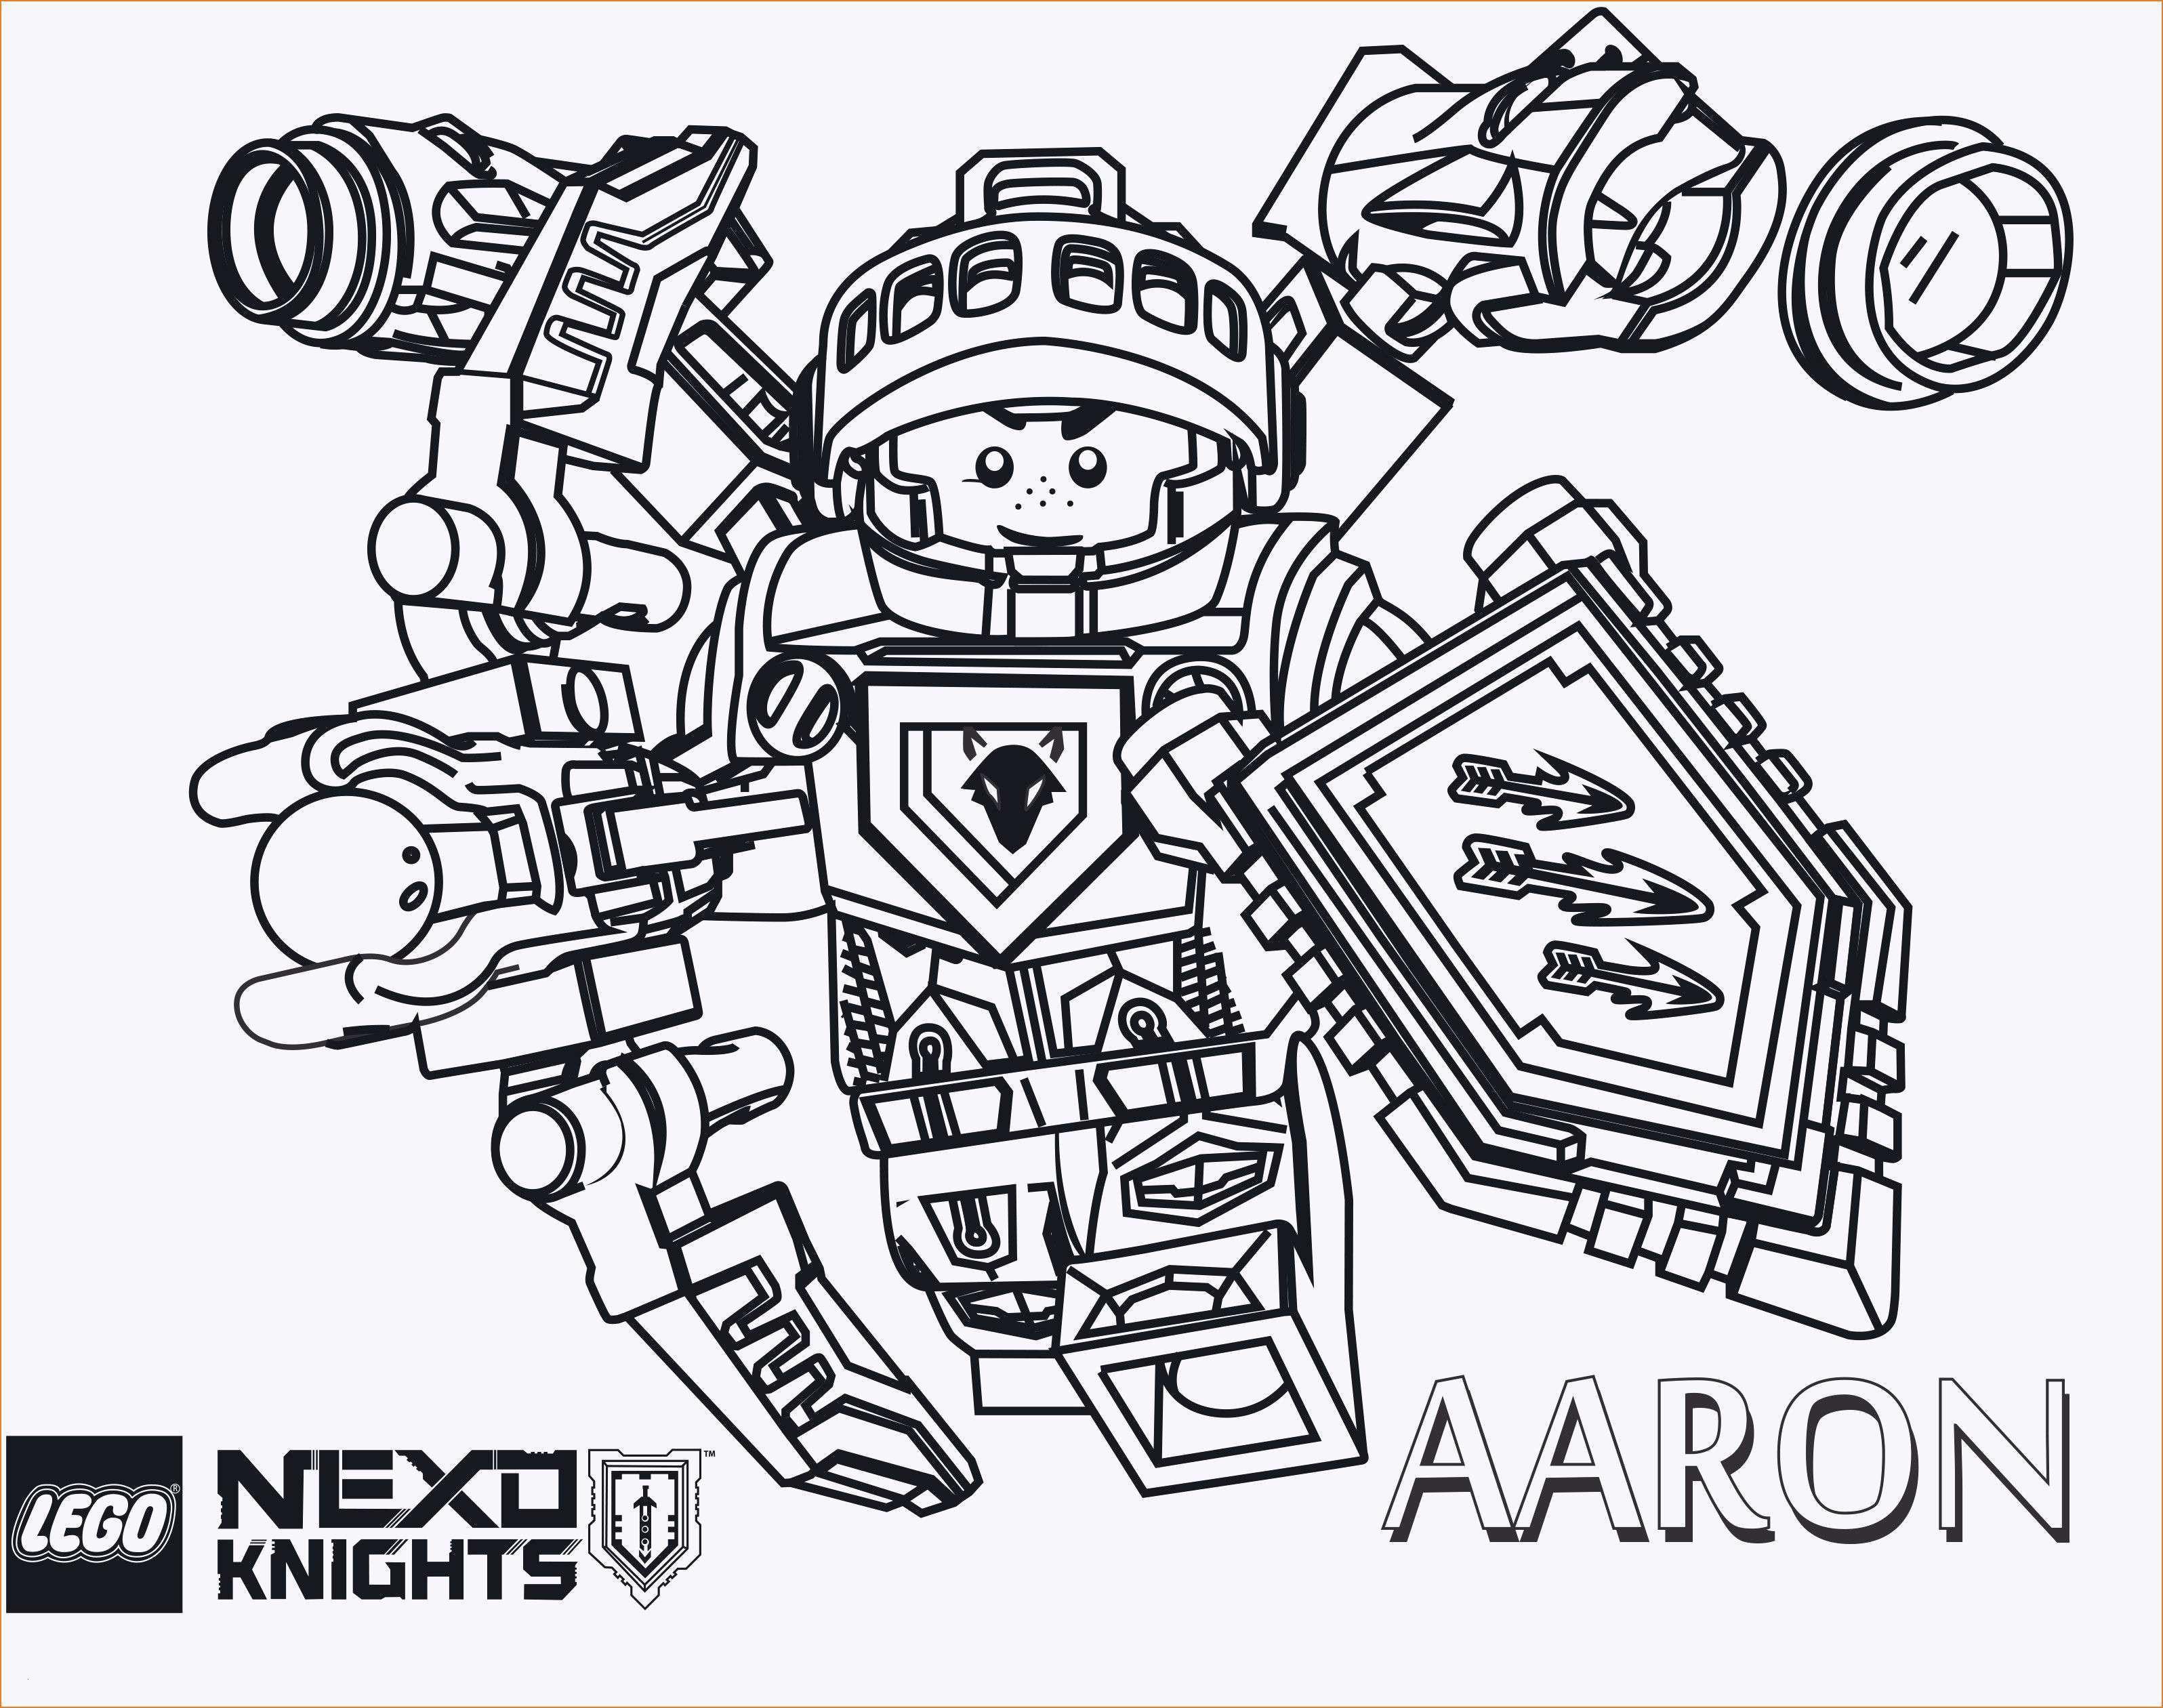 Ninjago Zane Ausmalbilder Das Beste Von Coloring Pages for Boys Lego Ninjago Printable Coloring Pages for Stock